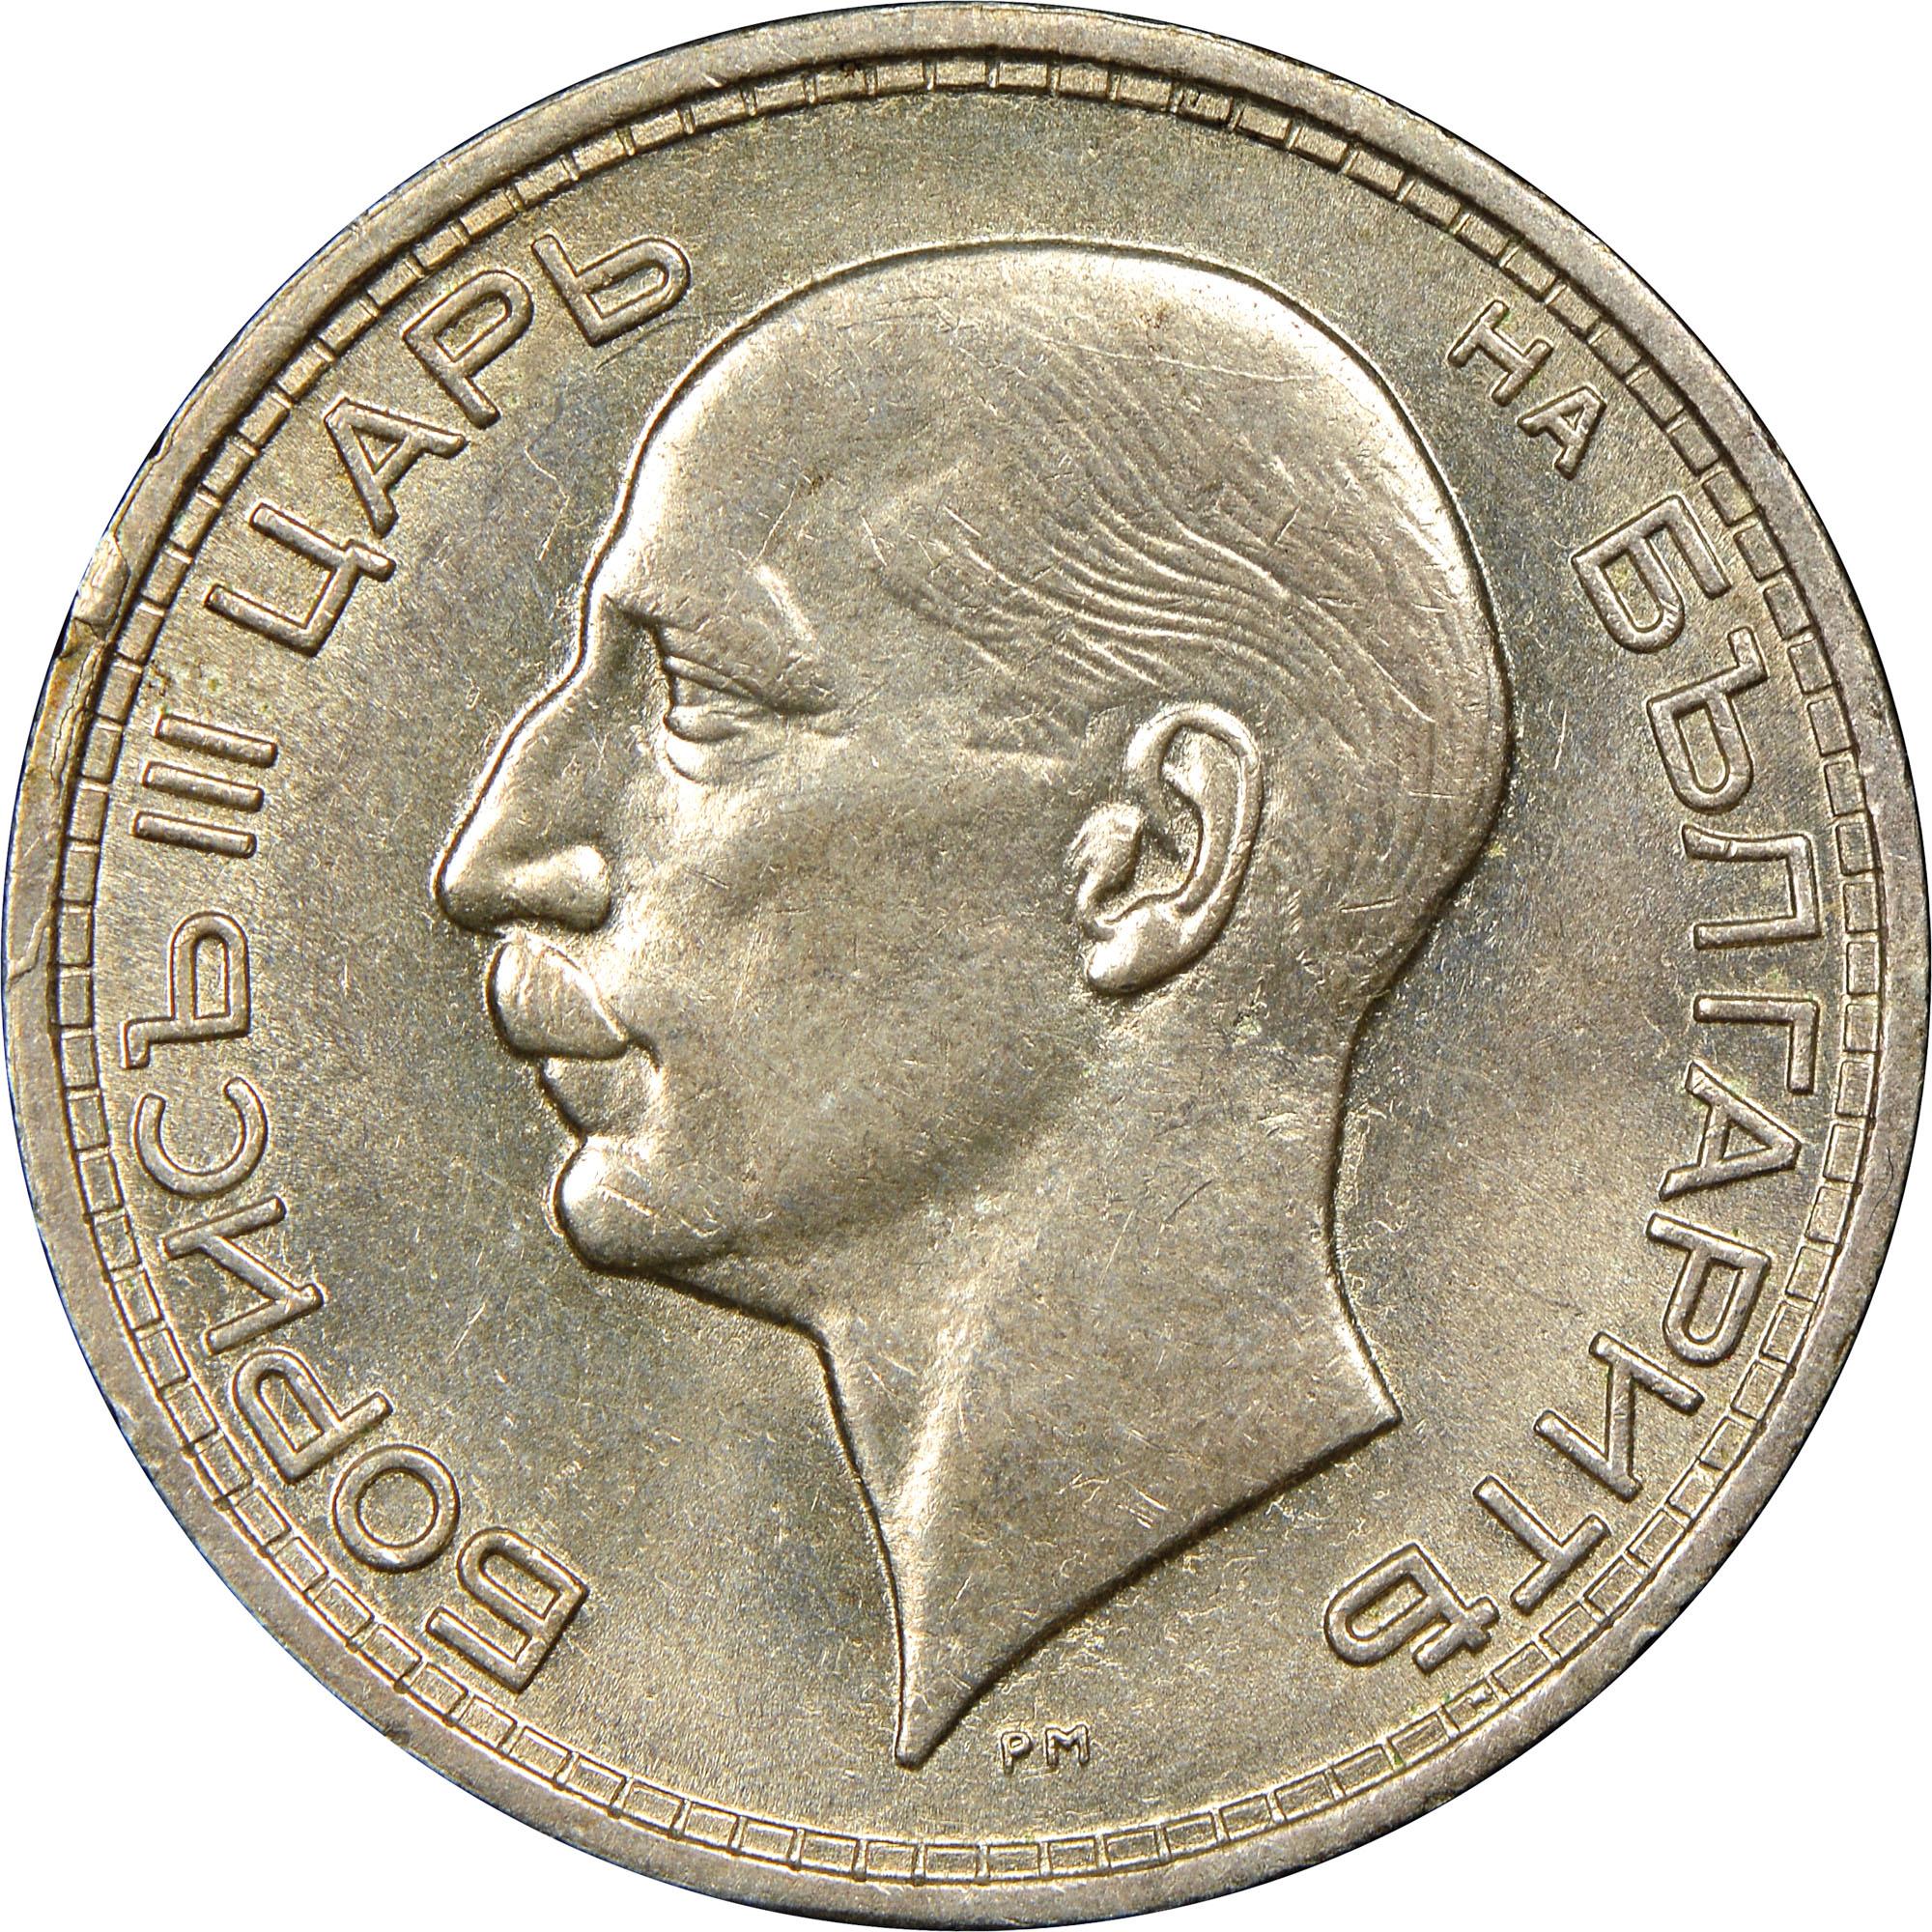 1934 Bulgaria 50 Leva obverse